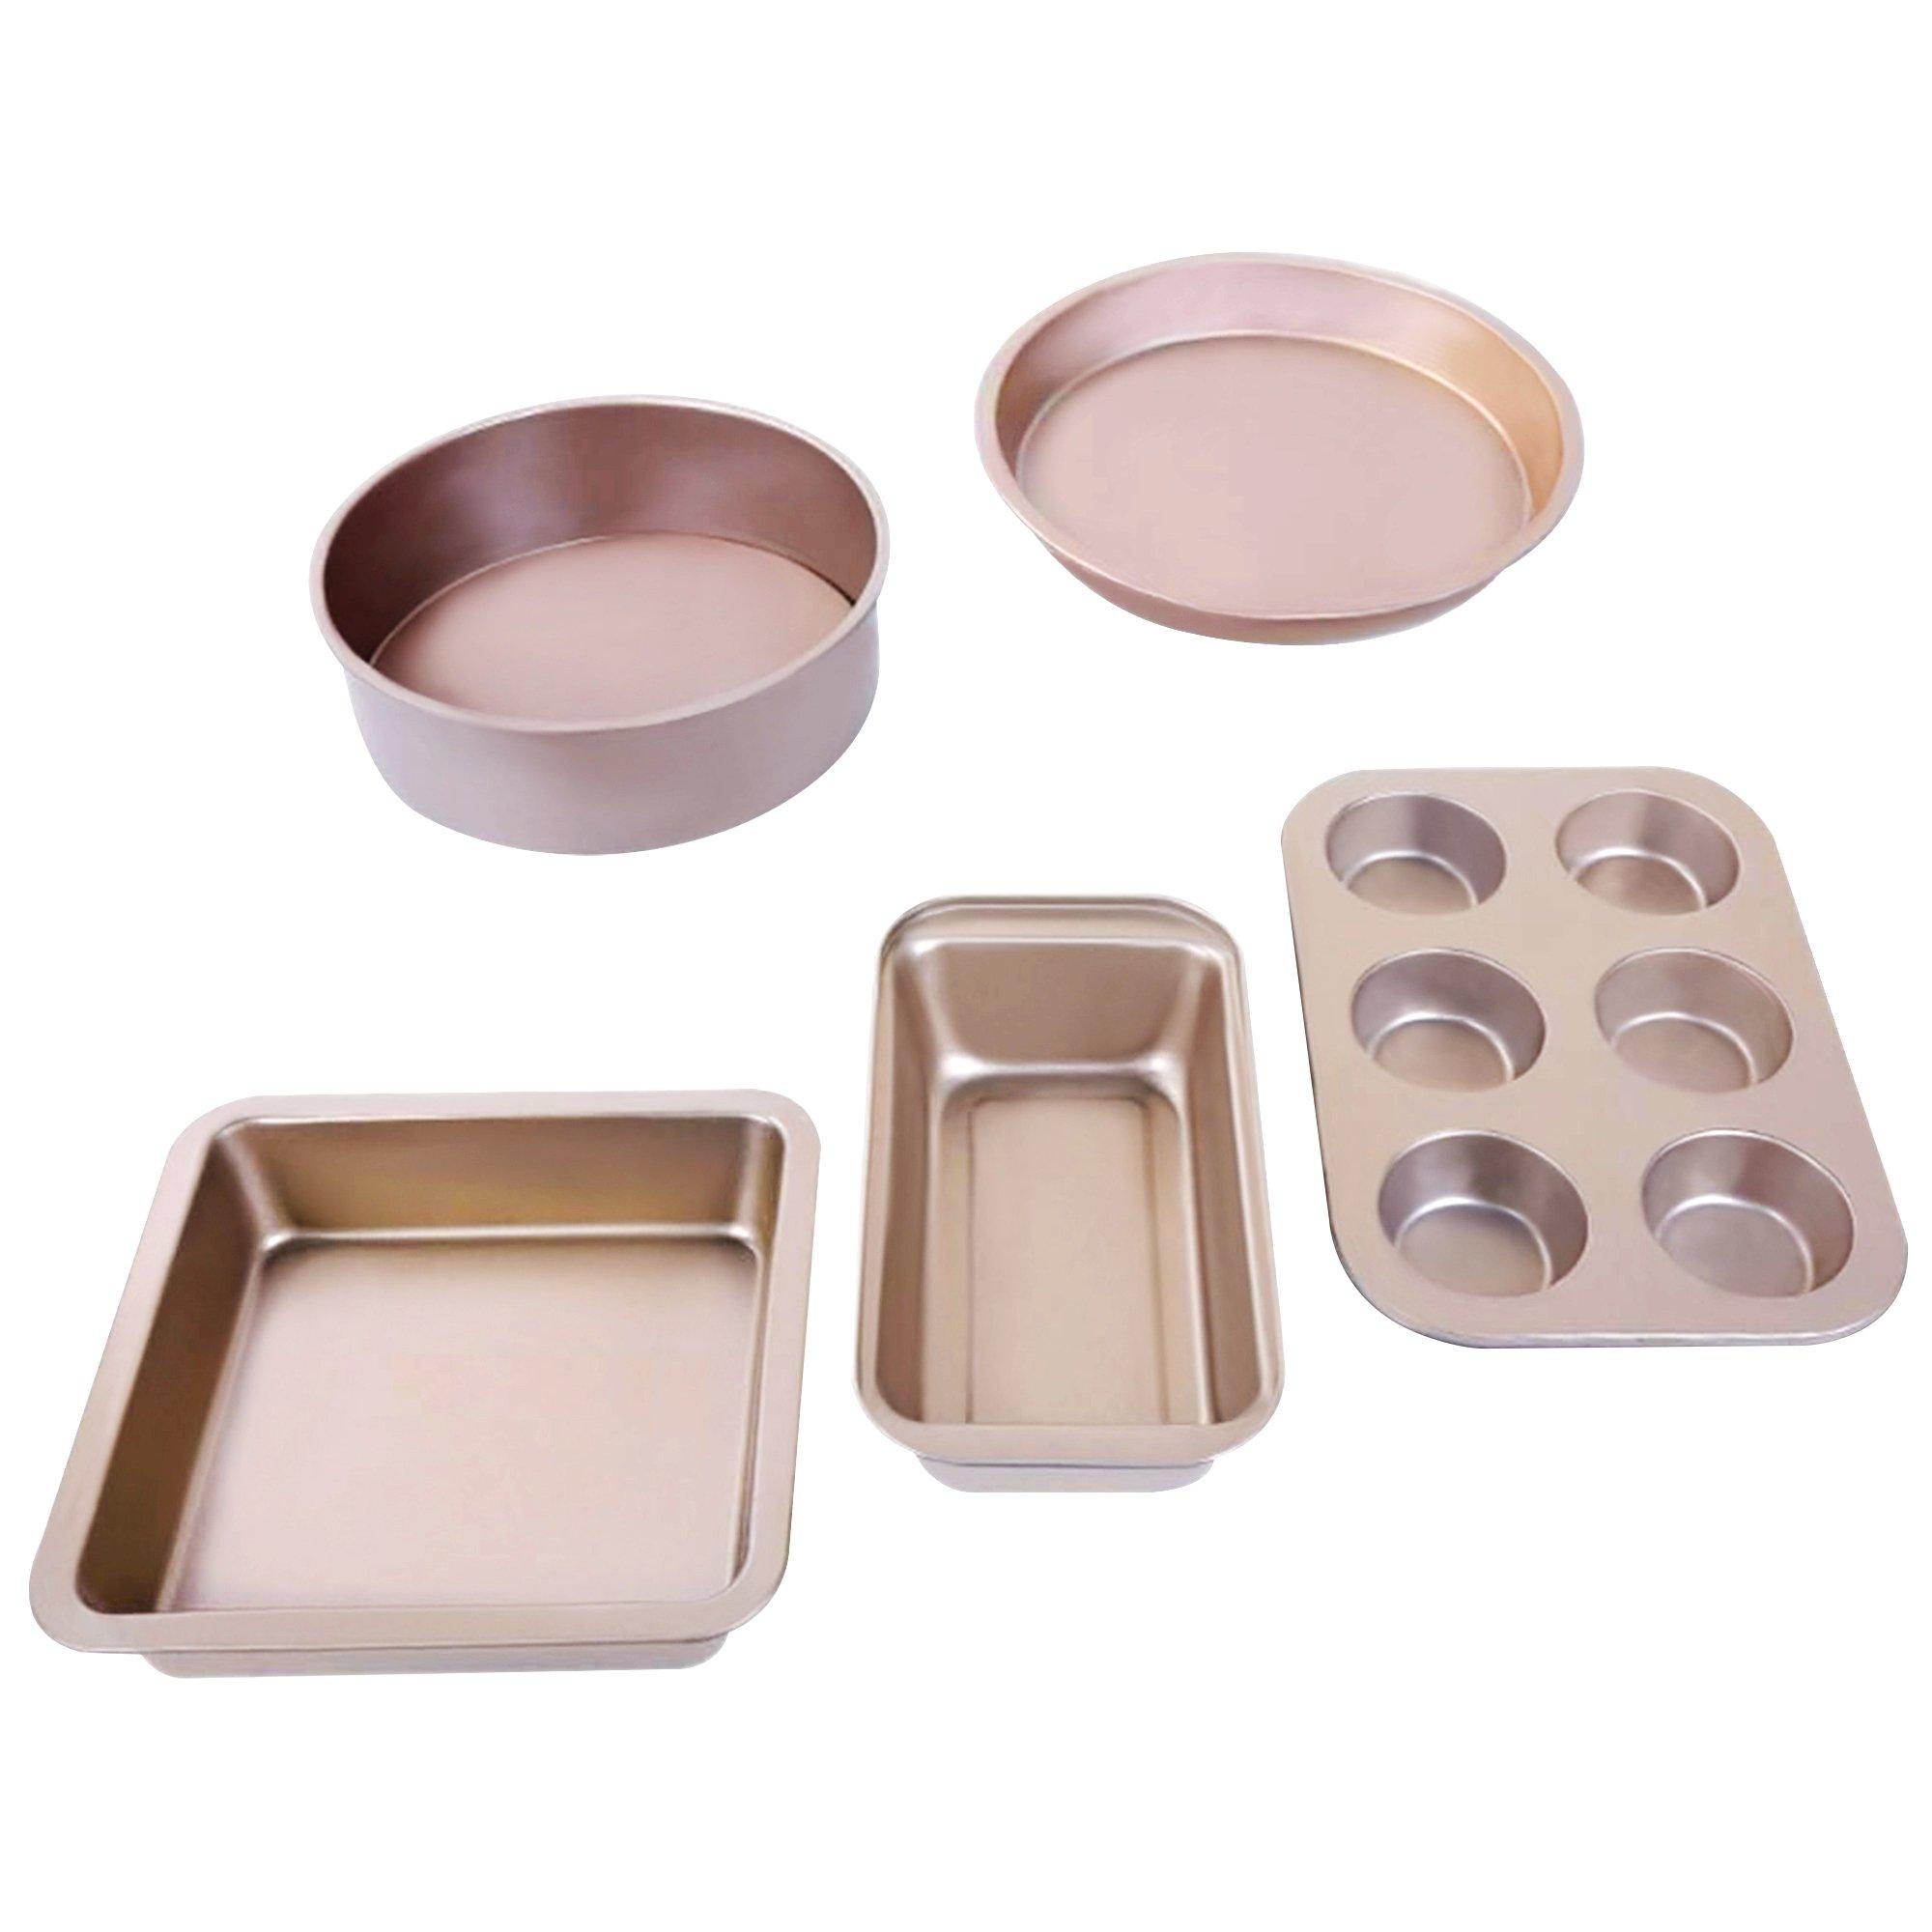 5Pcs Non Stick Bake Ware Set